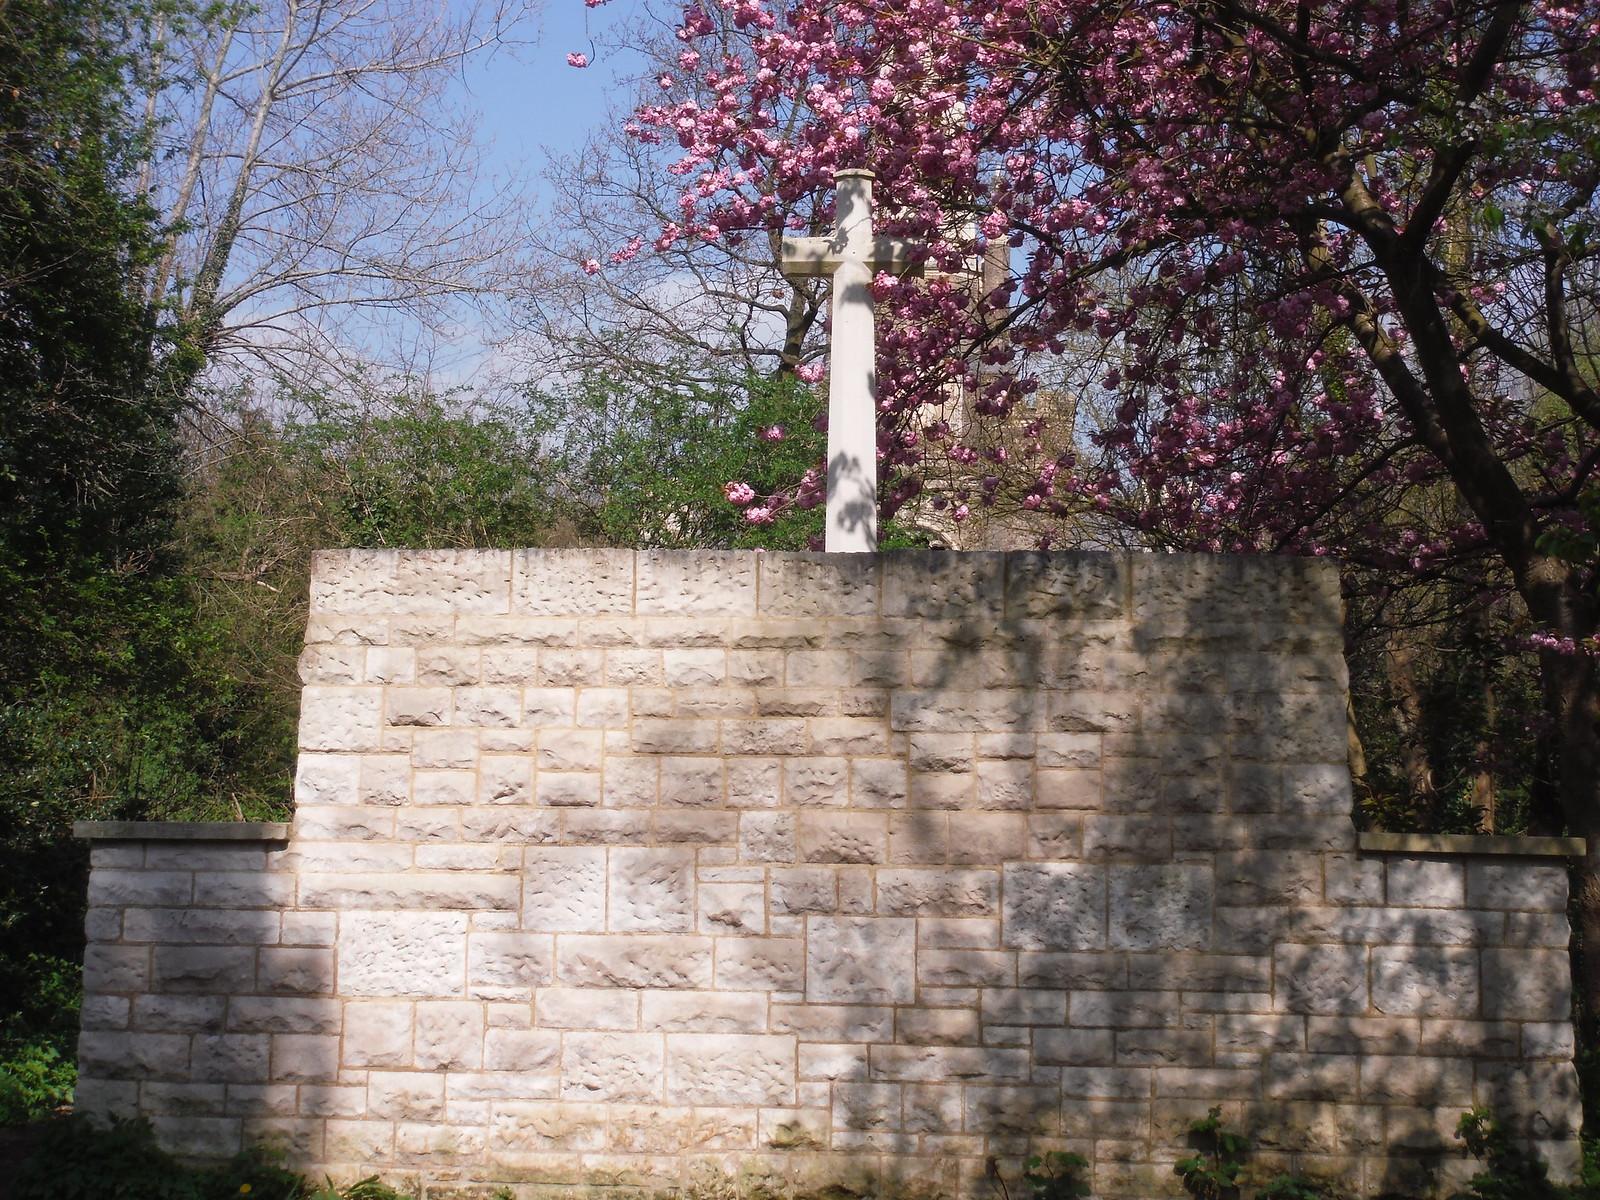 War Memorial, Abney Park Cemetery SWC Short Walk 26 - Woodberry Wetlands (Stoke Newington Reservoirs)